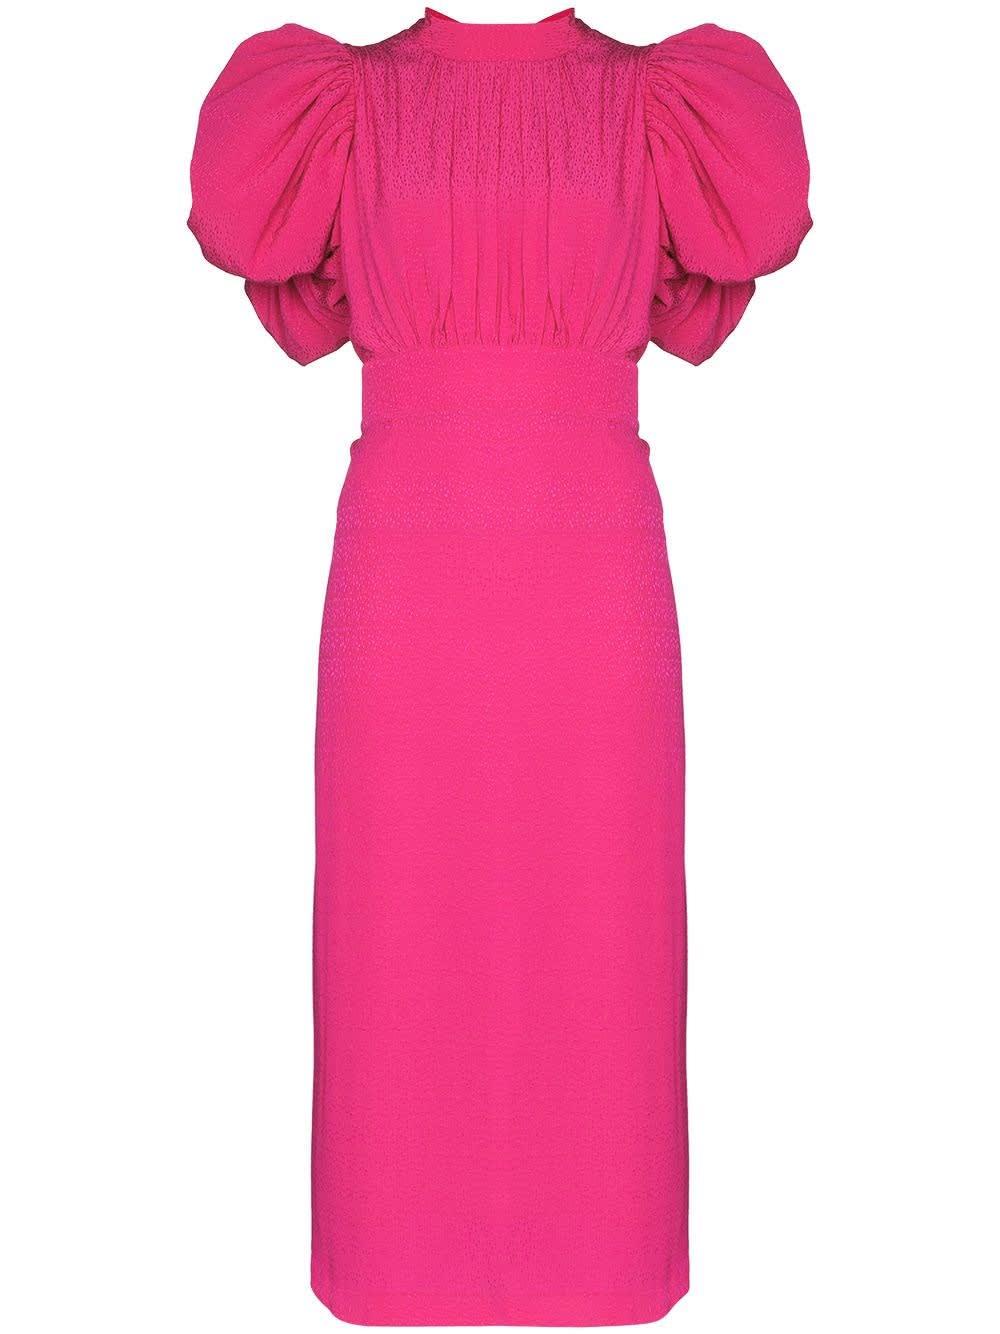 Rotate Birger Christensen Dresses PINK VISCOSE DRESS WITH BACK BOWS DETAIL